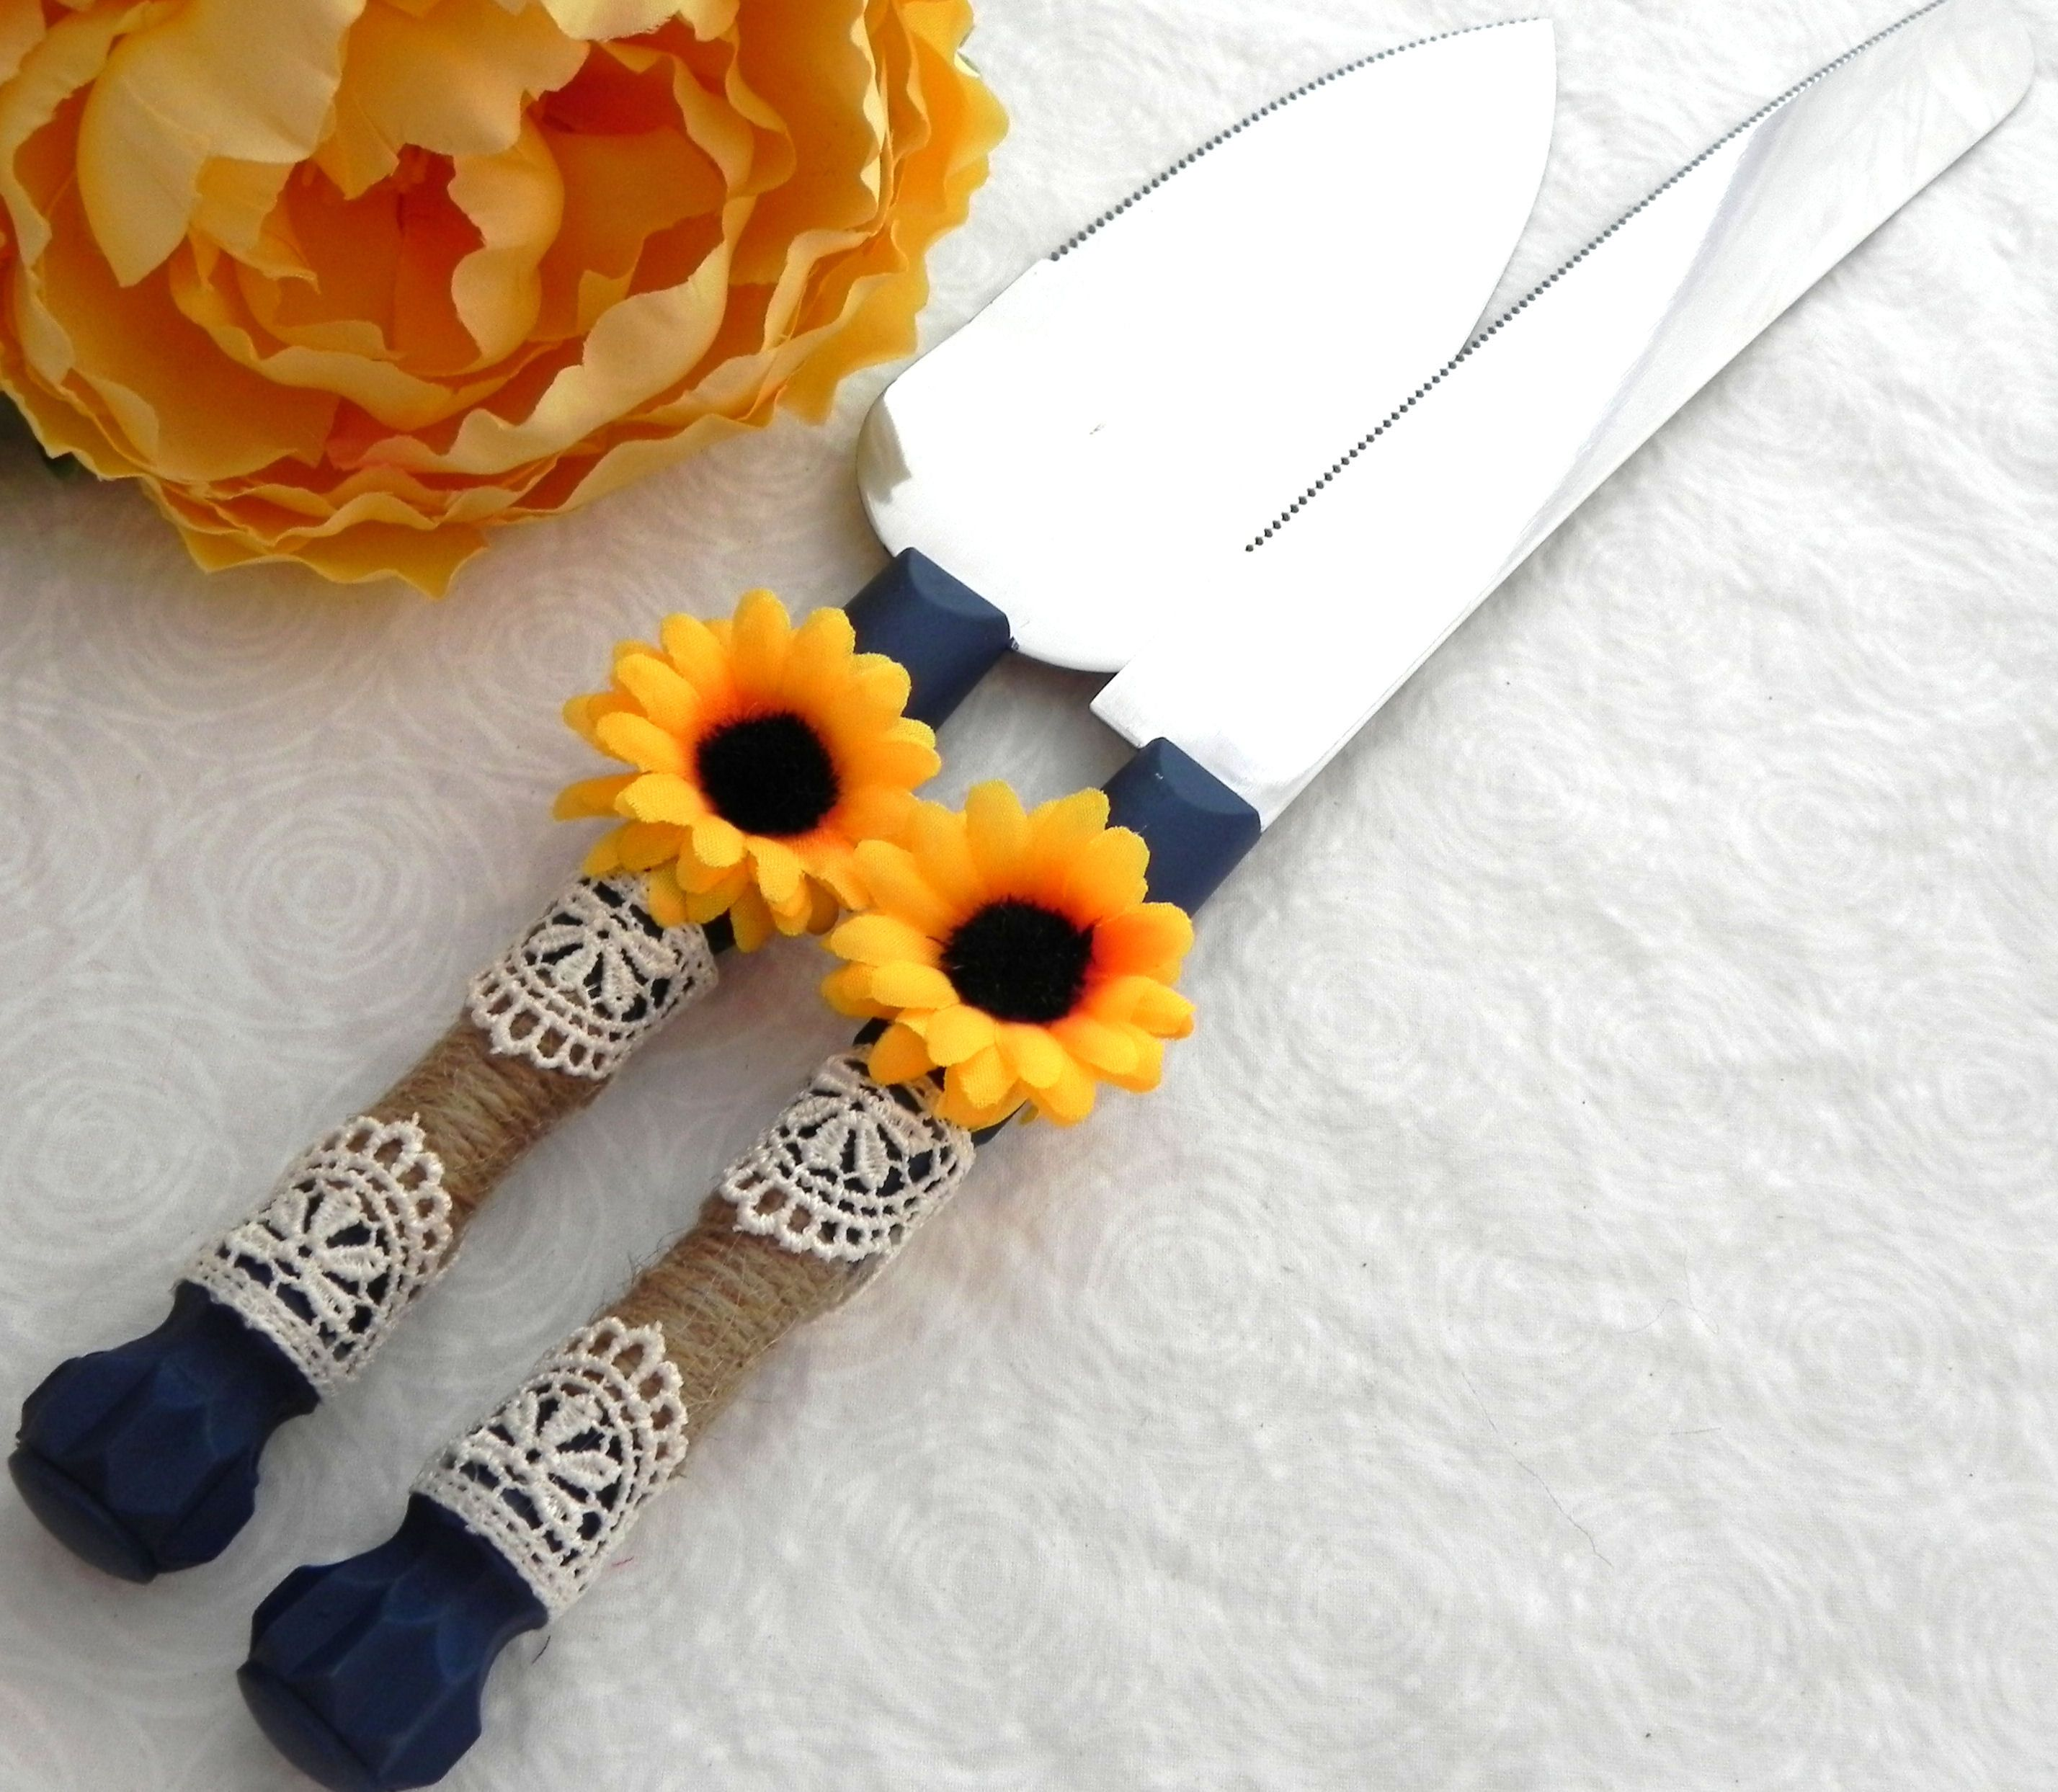 Rustic Sunflower Wedding Cake Server And Knife Set, Navy